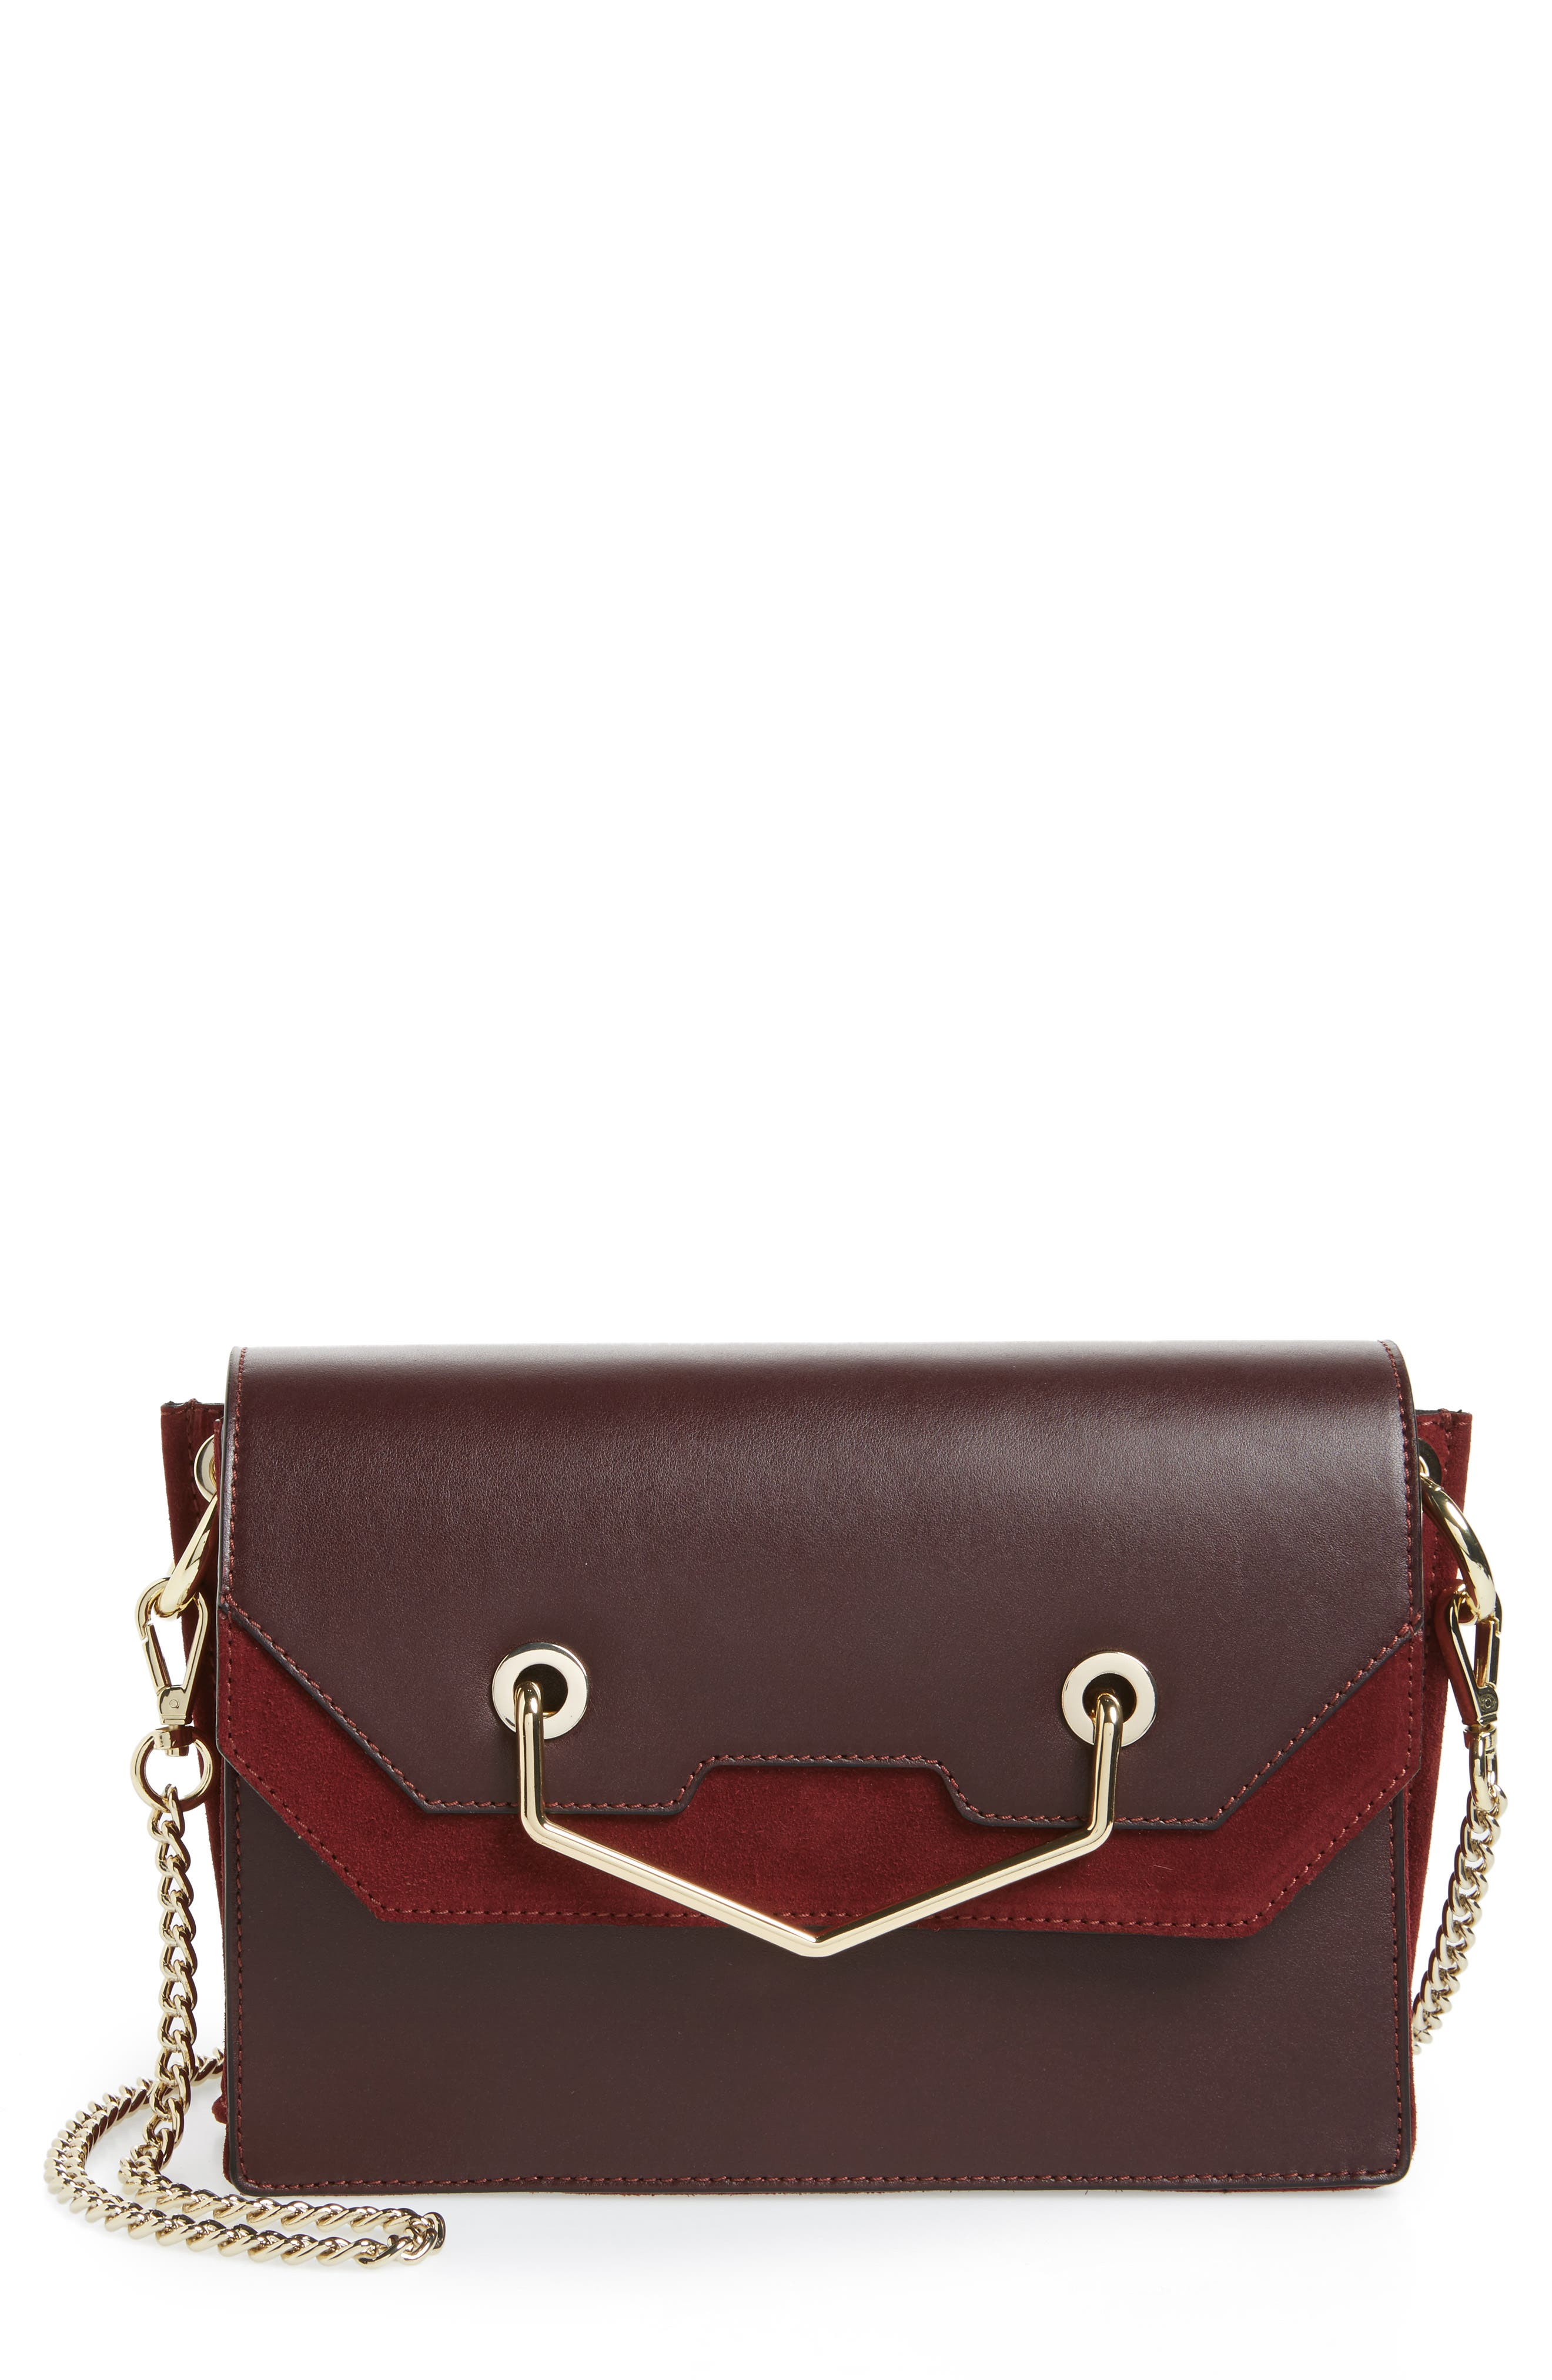 Main Image - Topshop Premium Leather & Suede Soko Shoulder Bag